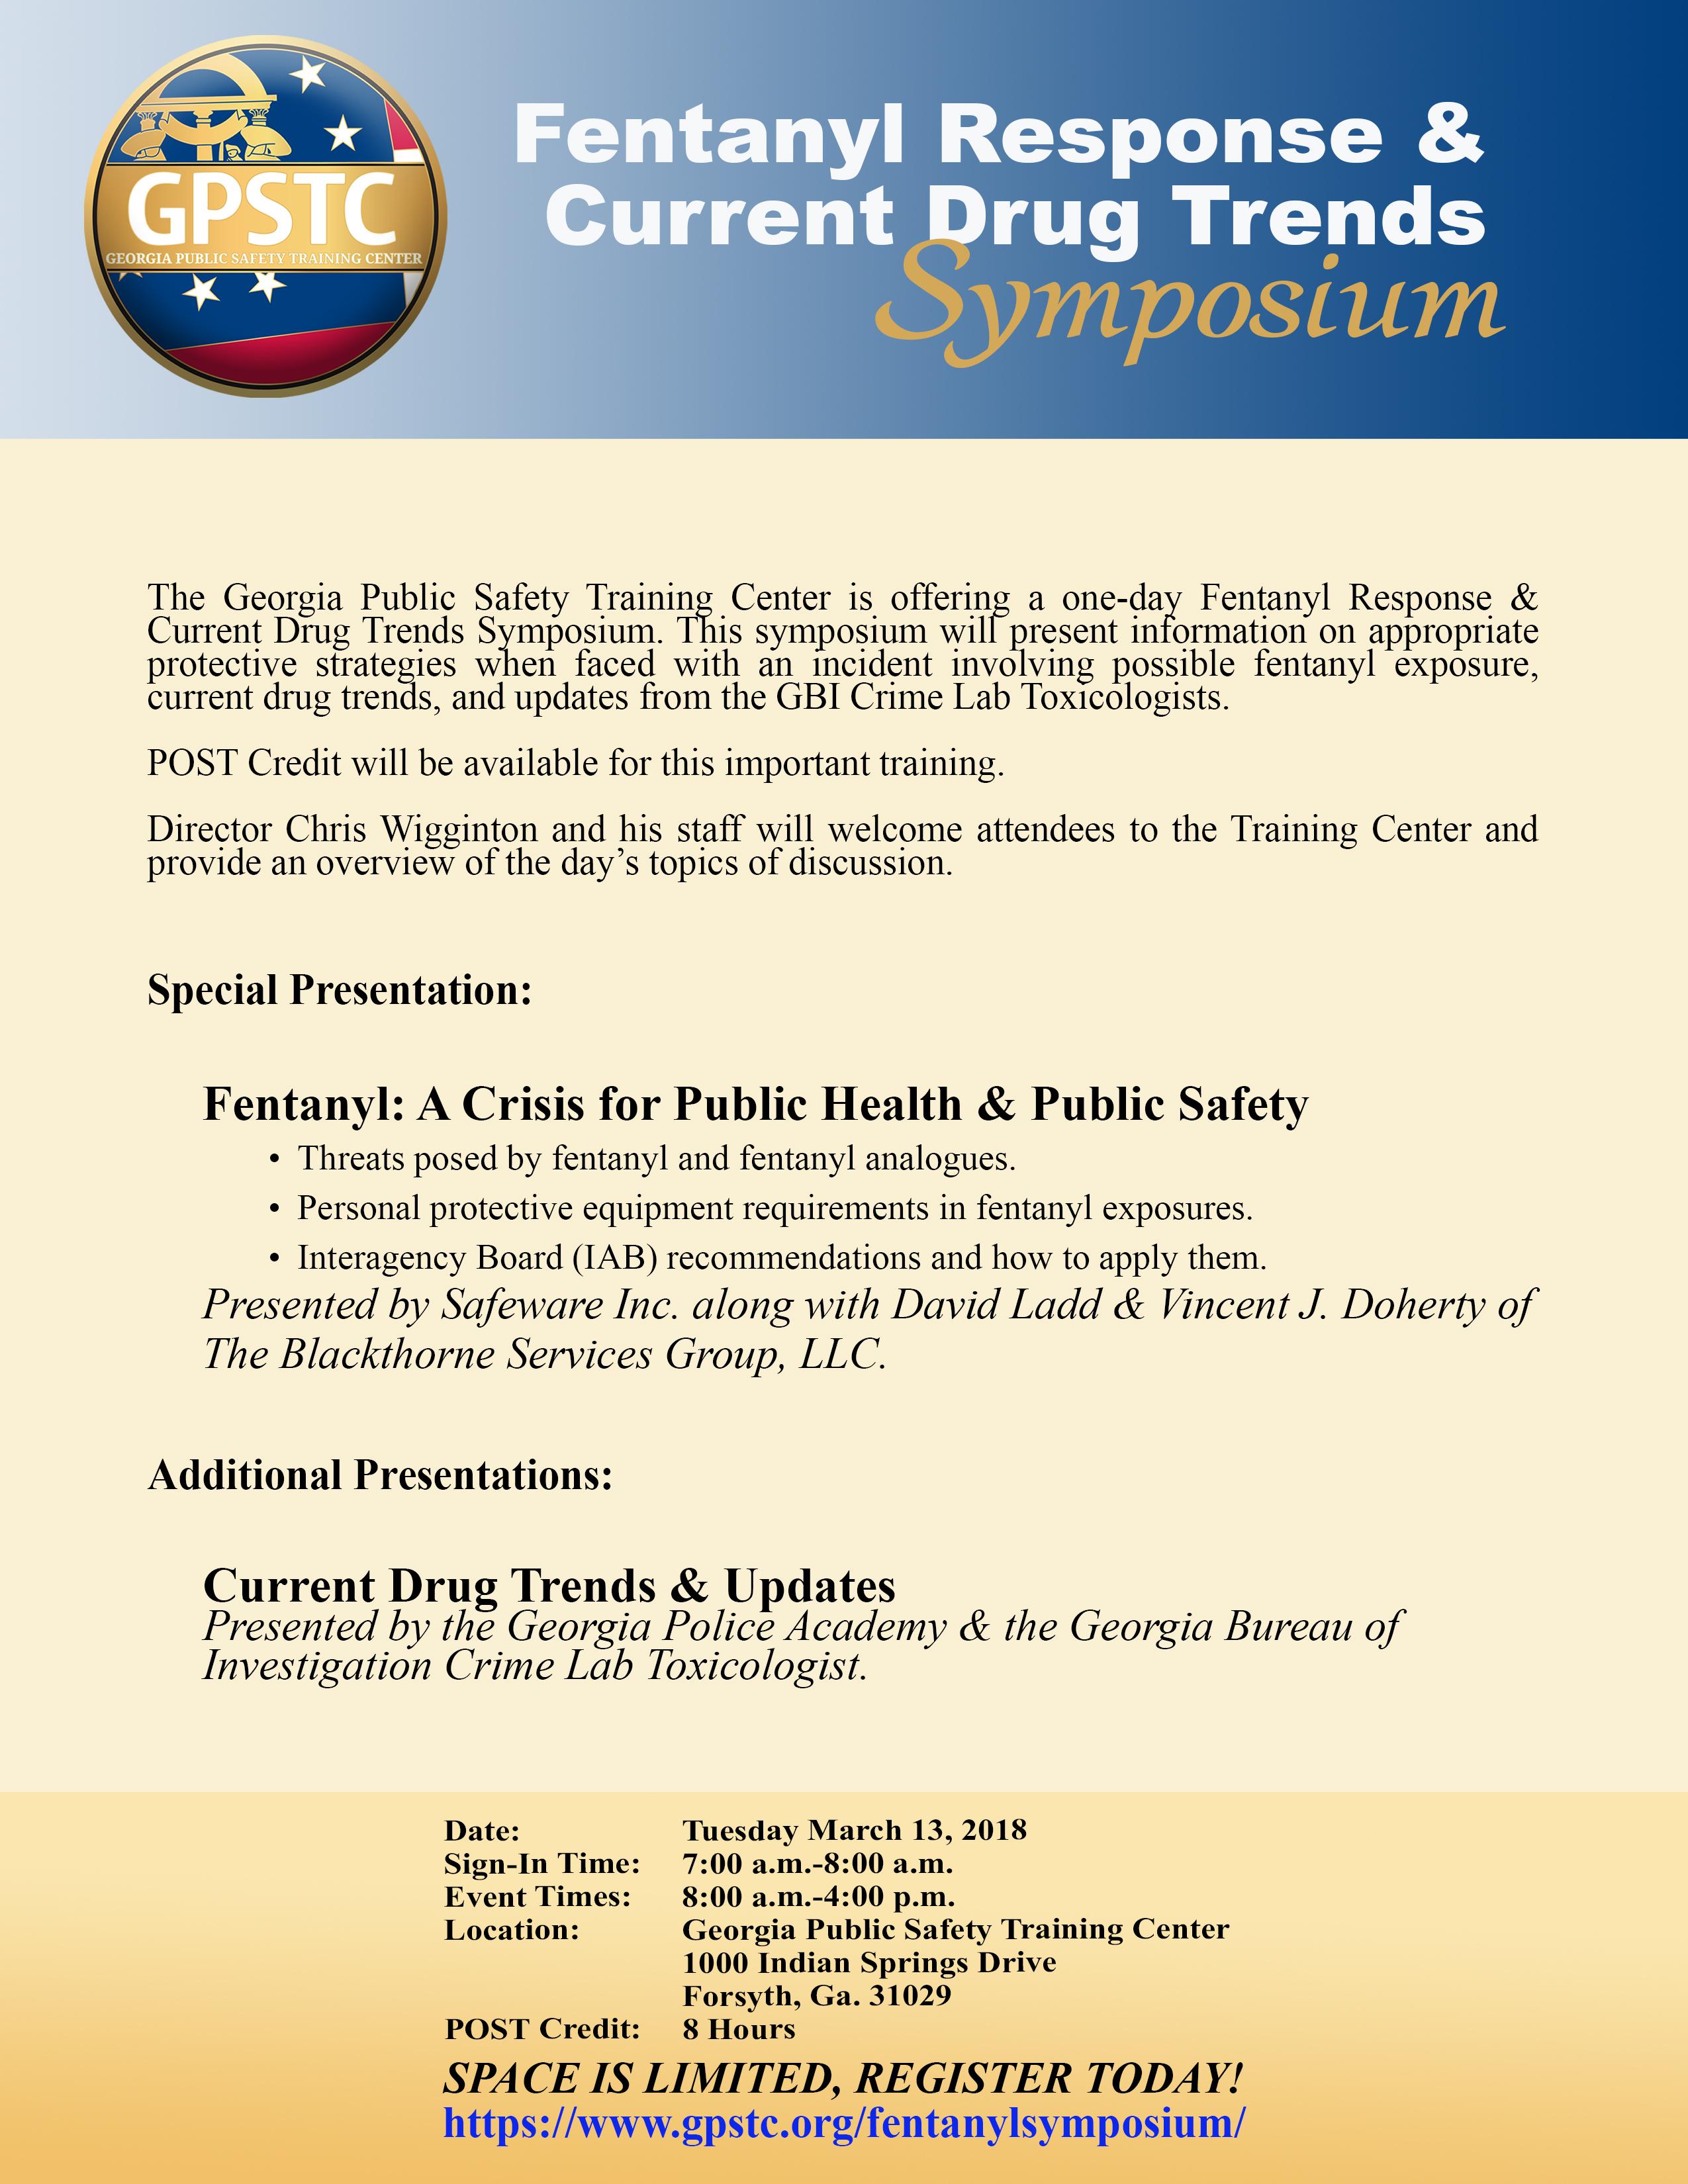 Fentanyl Response & Current Drug Trends Symposium - GPSTC